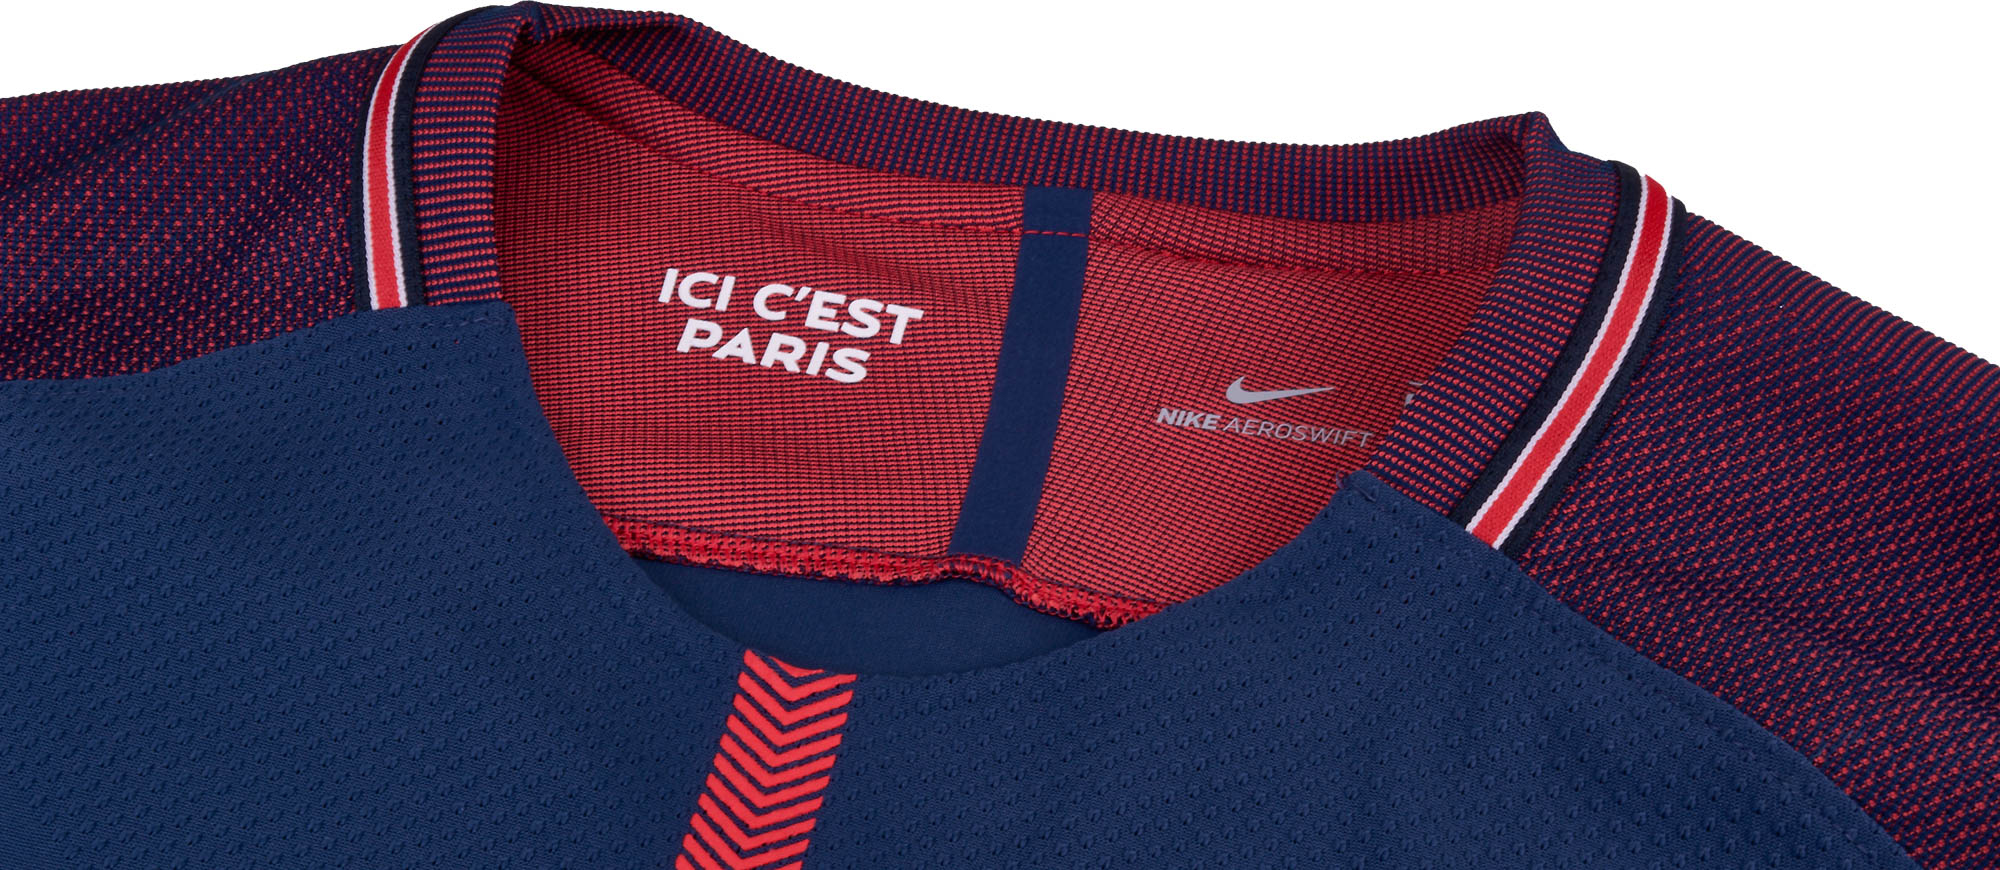 Nike PSG Match Home Jersey 2017-18 - Soccer Master 0d841960b